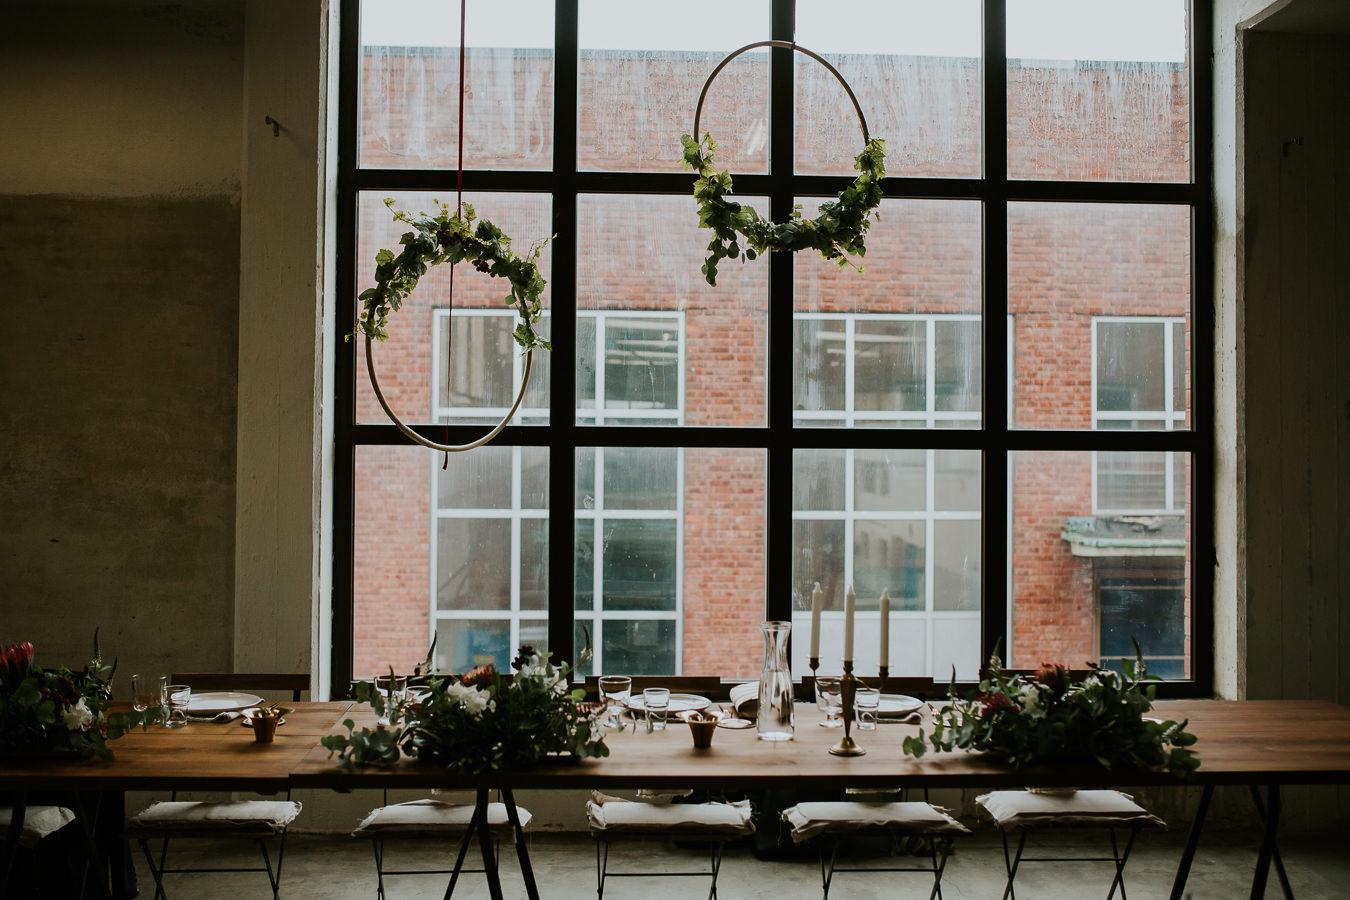 Bryllup-Lageret-Tofte-bryllupsfotograf-149.jpg